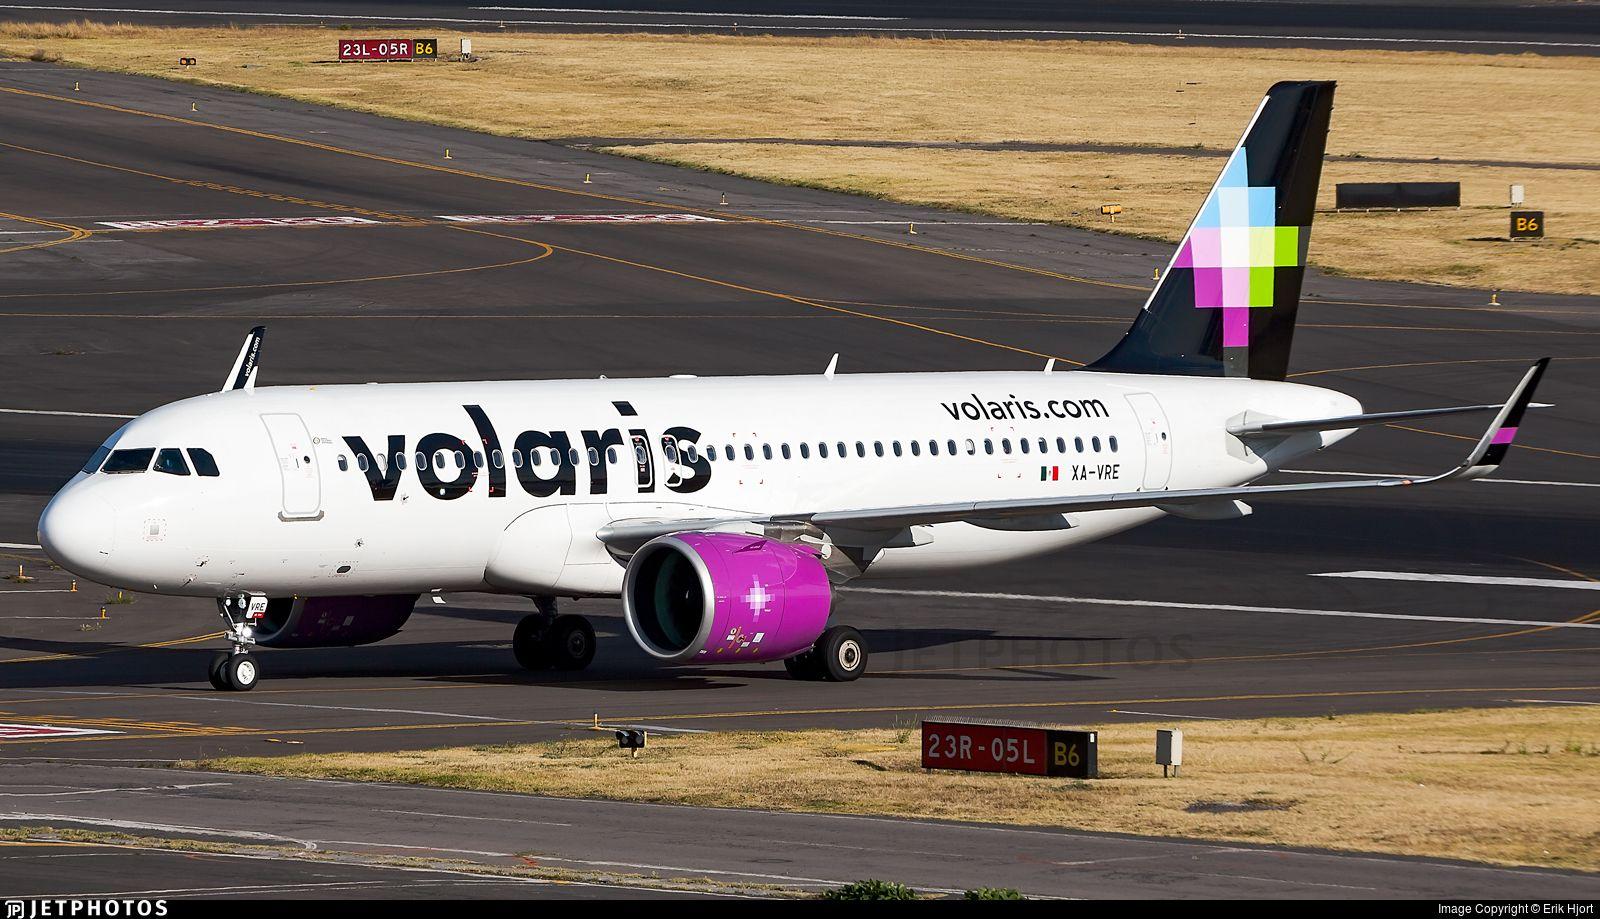 Airline: Volaris Registration: XA-VRE Aircraft Variant